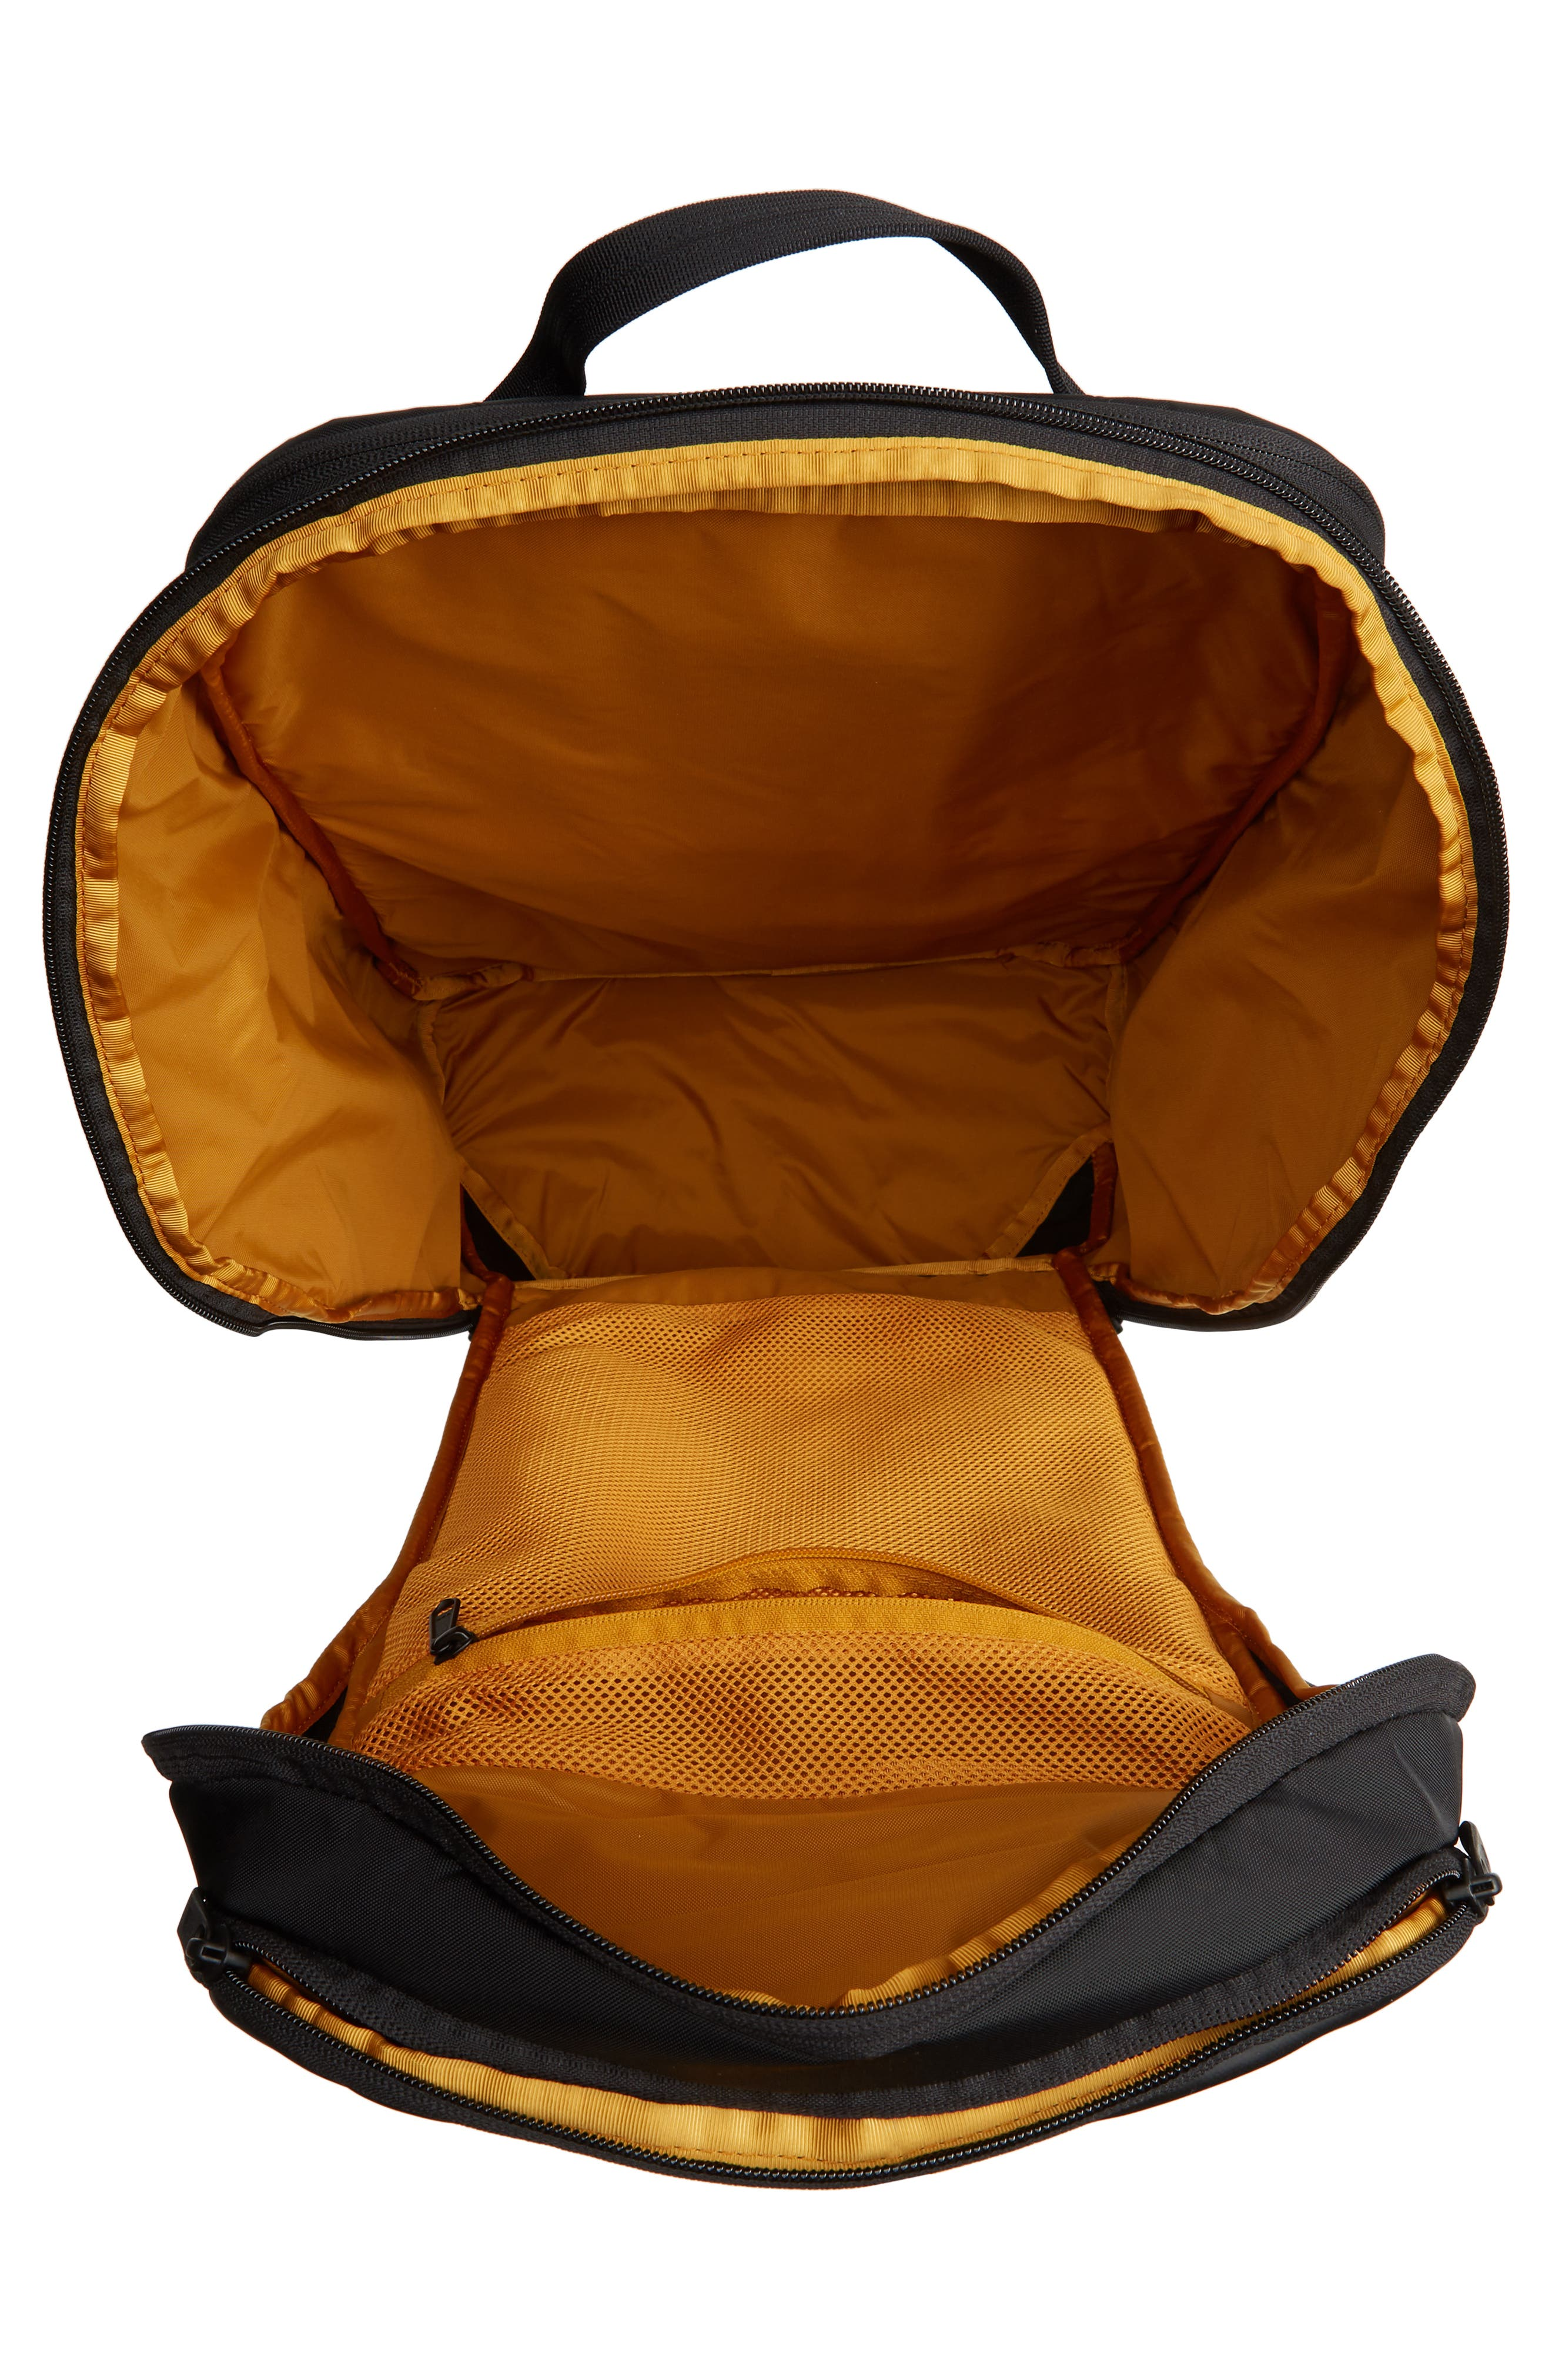 Kabig Backpack,                             Alternate thumbnail 4, color,                             001